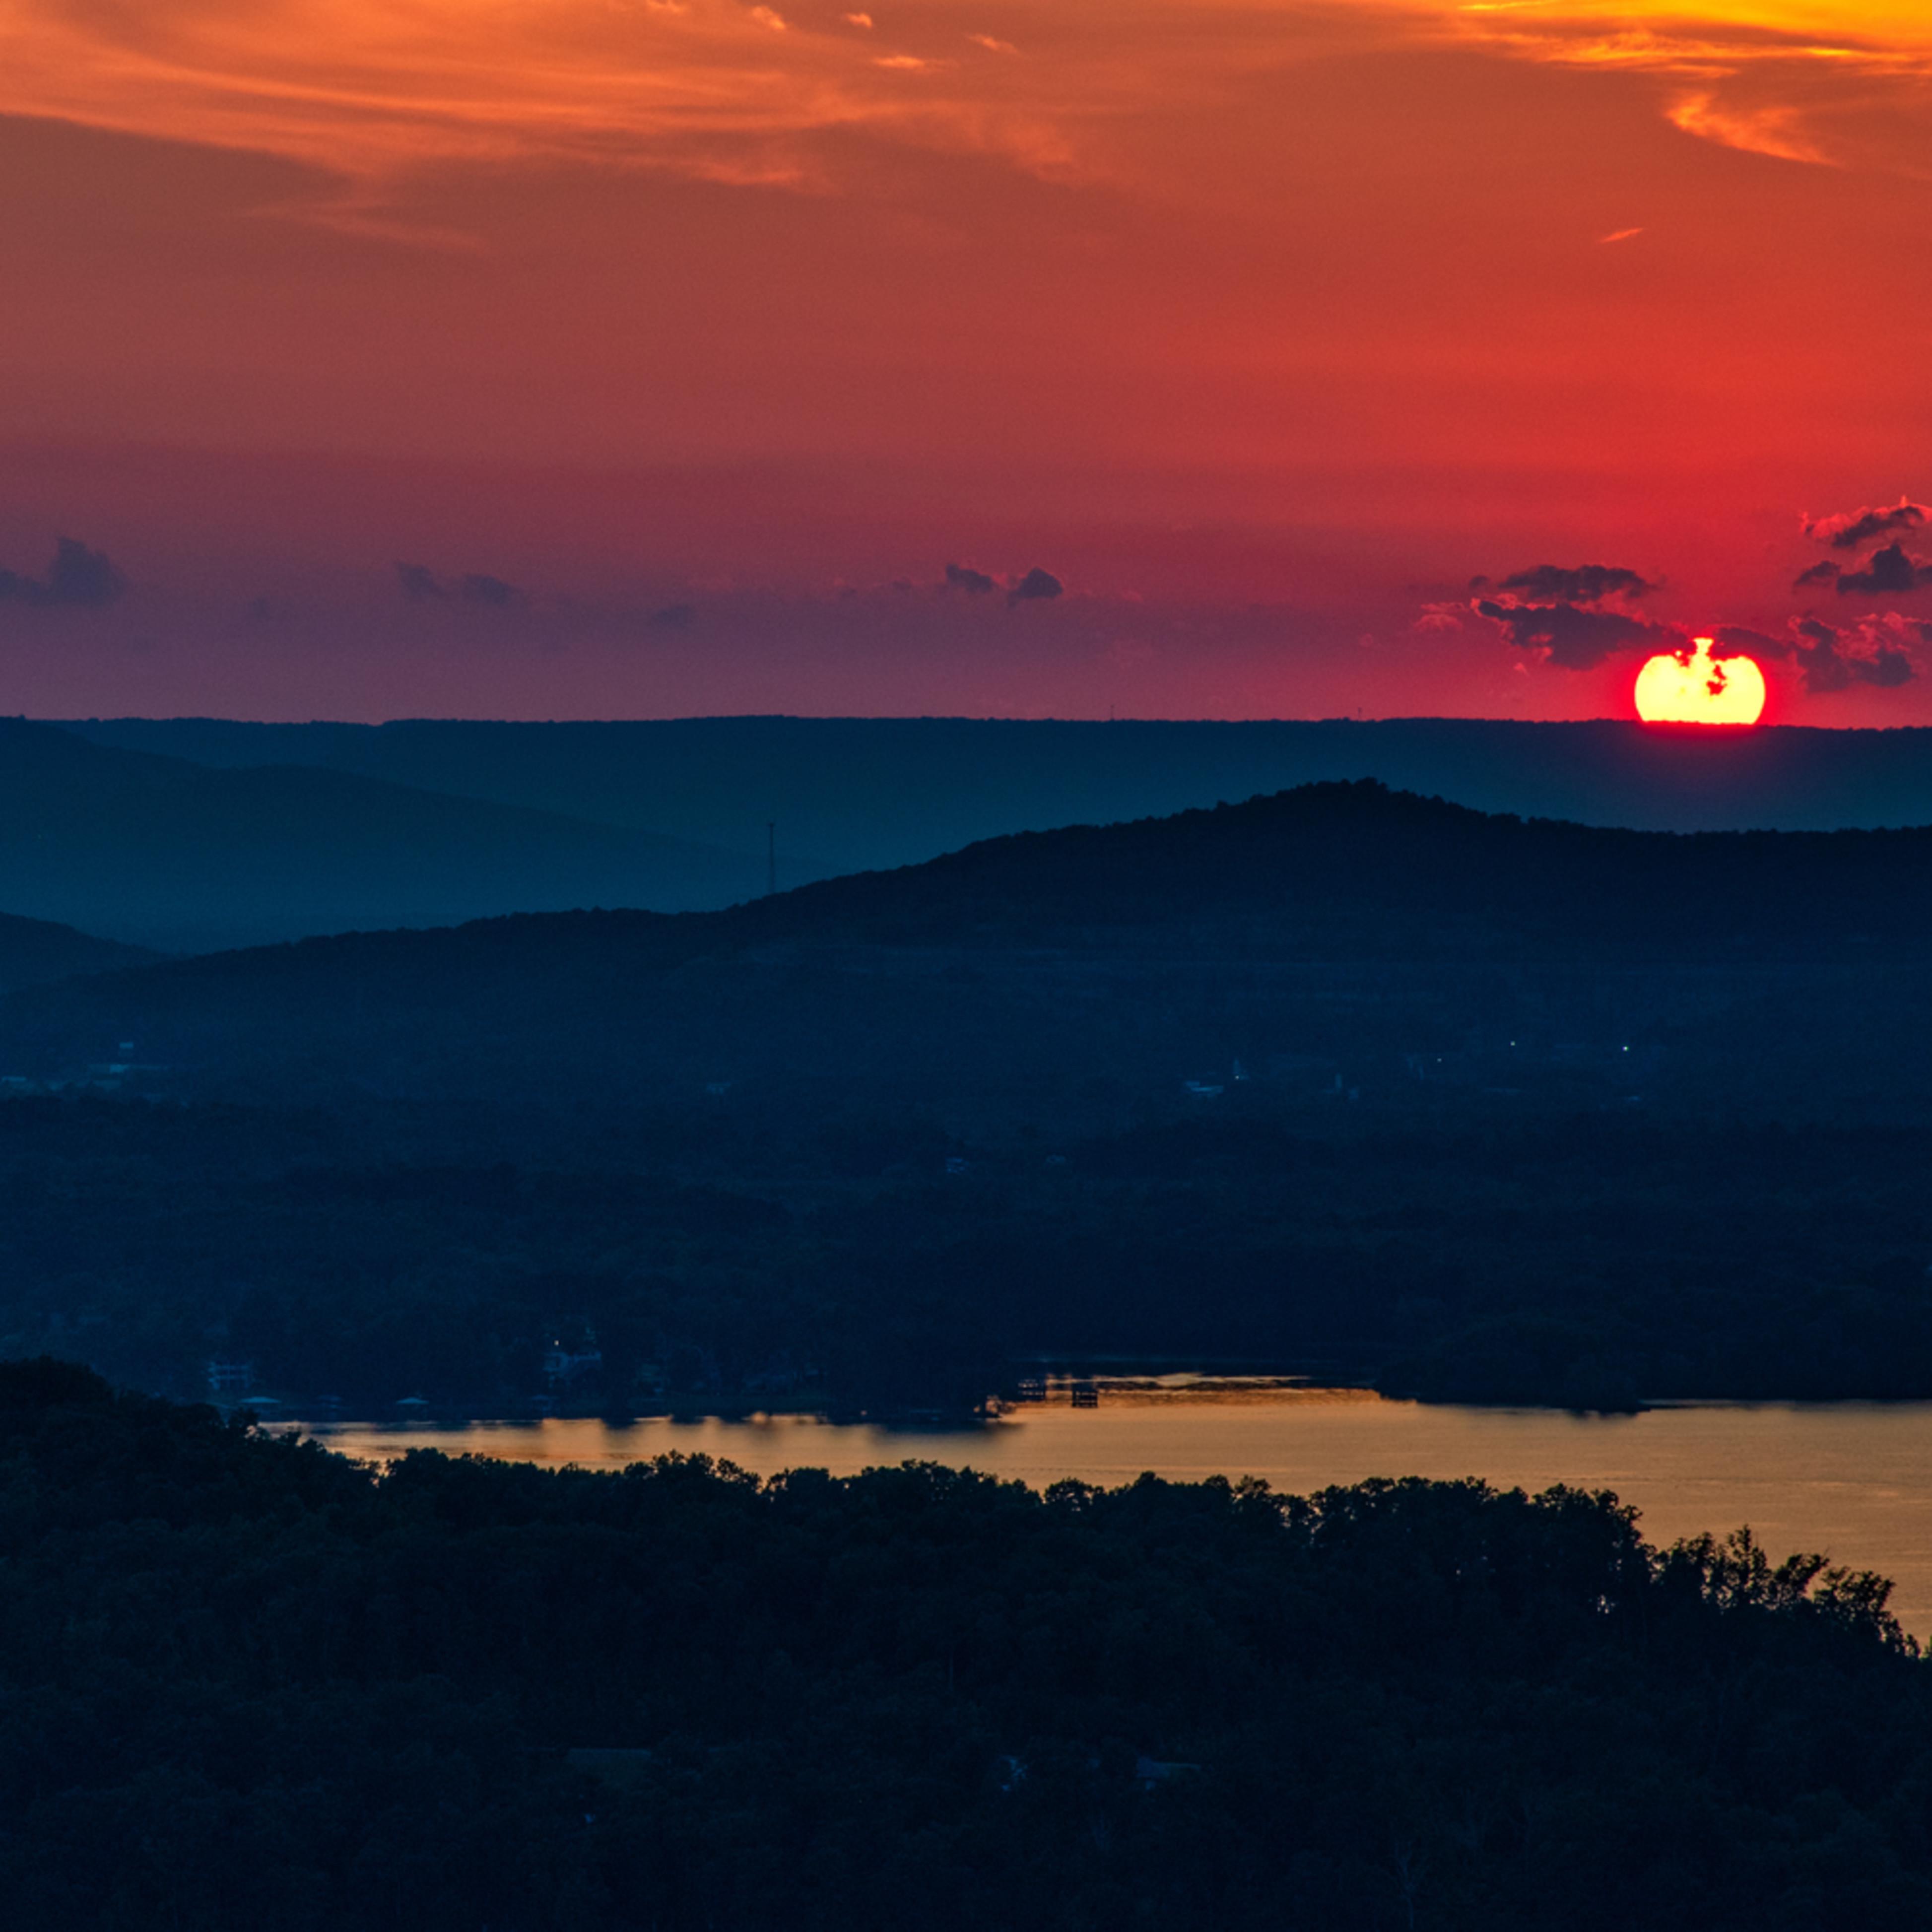 Andy crawford photography lake guntersville sunset 001 uowzle